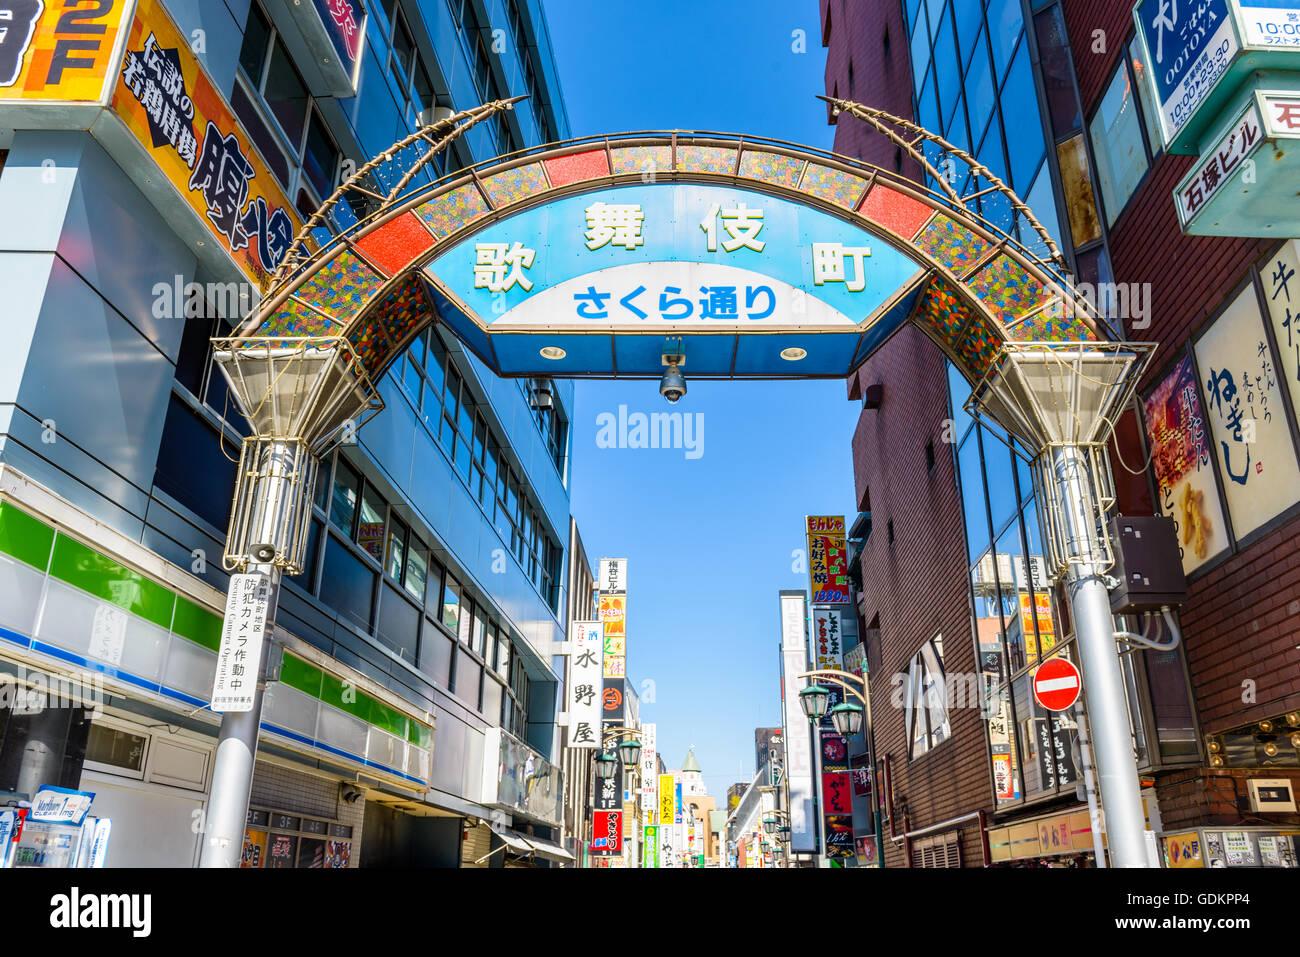 Sign marking the Sakura-dori entrance to Kabuki-cho, Shinjuku, Kyoto, Japan. - Stock Image